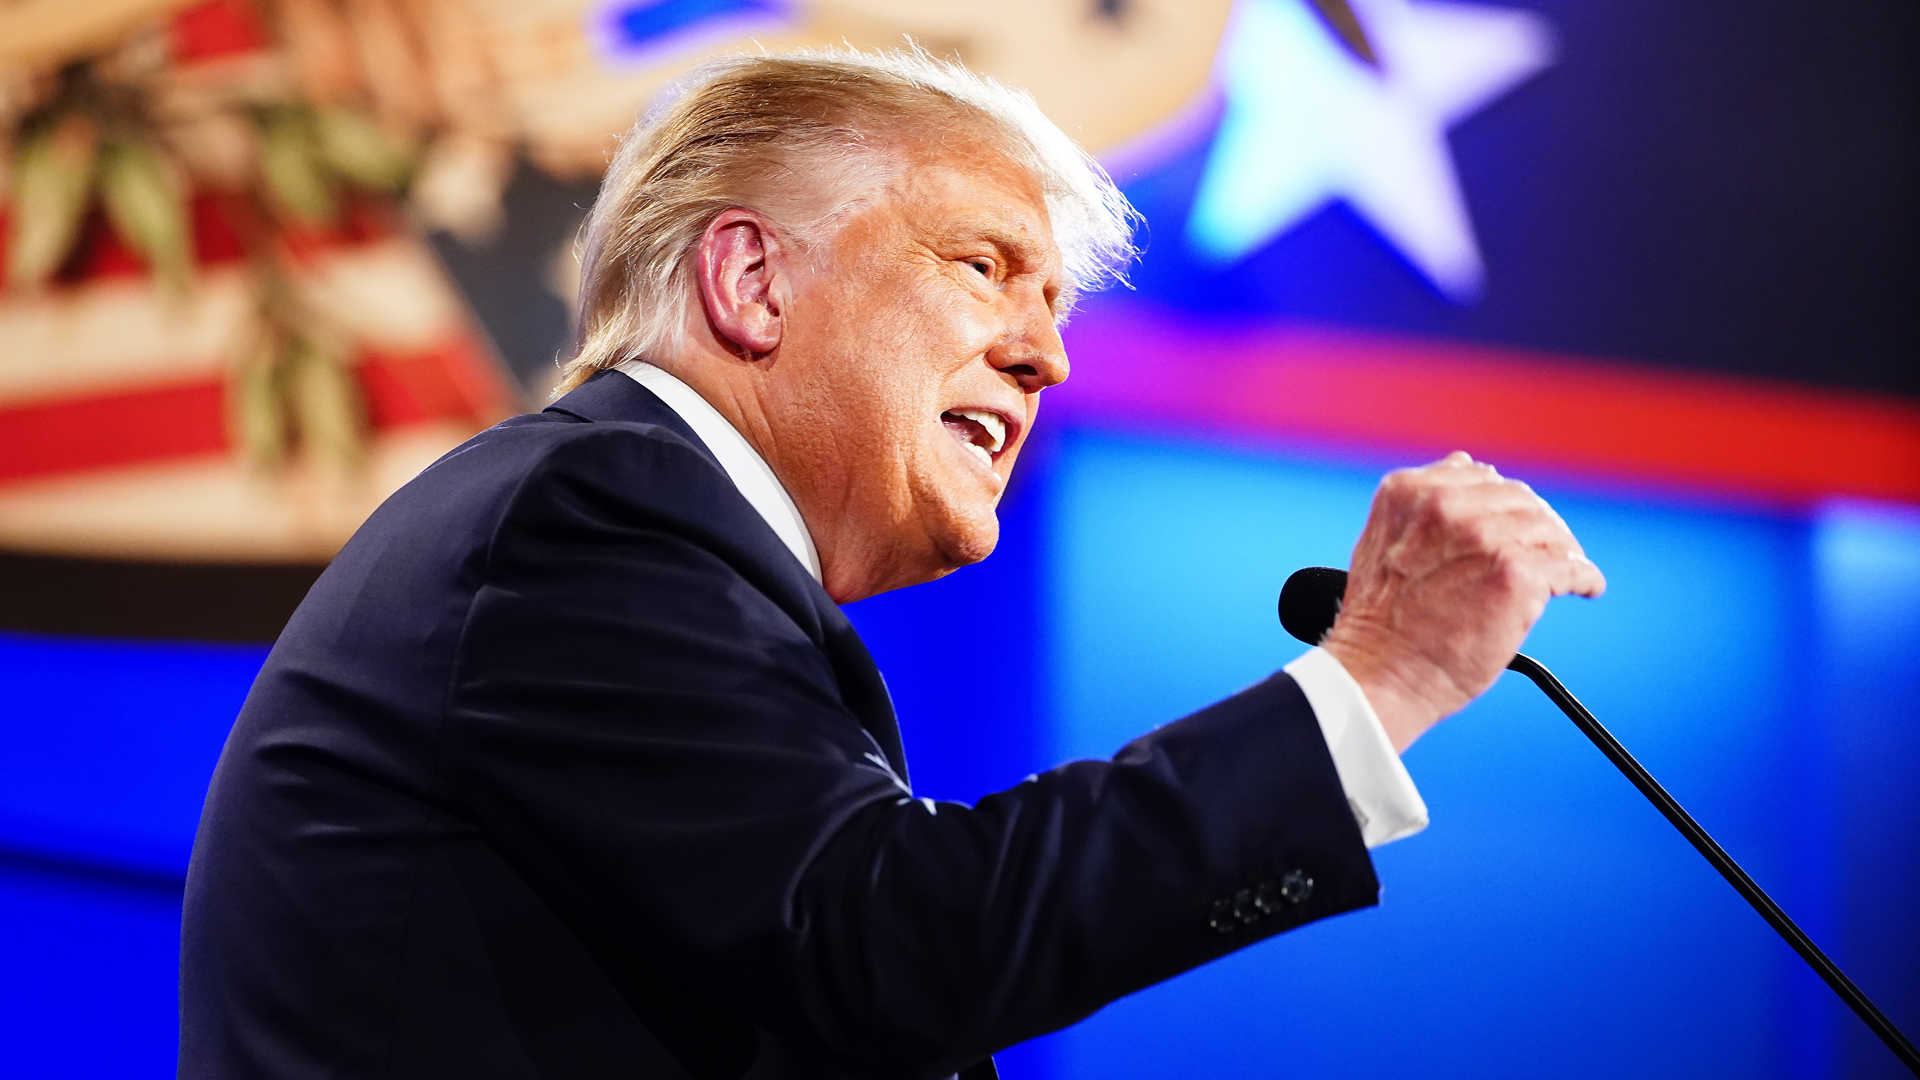 First 2020 presidential election debate between US President Donald J. Trump and Democratic presidential candidate Joe Biden